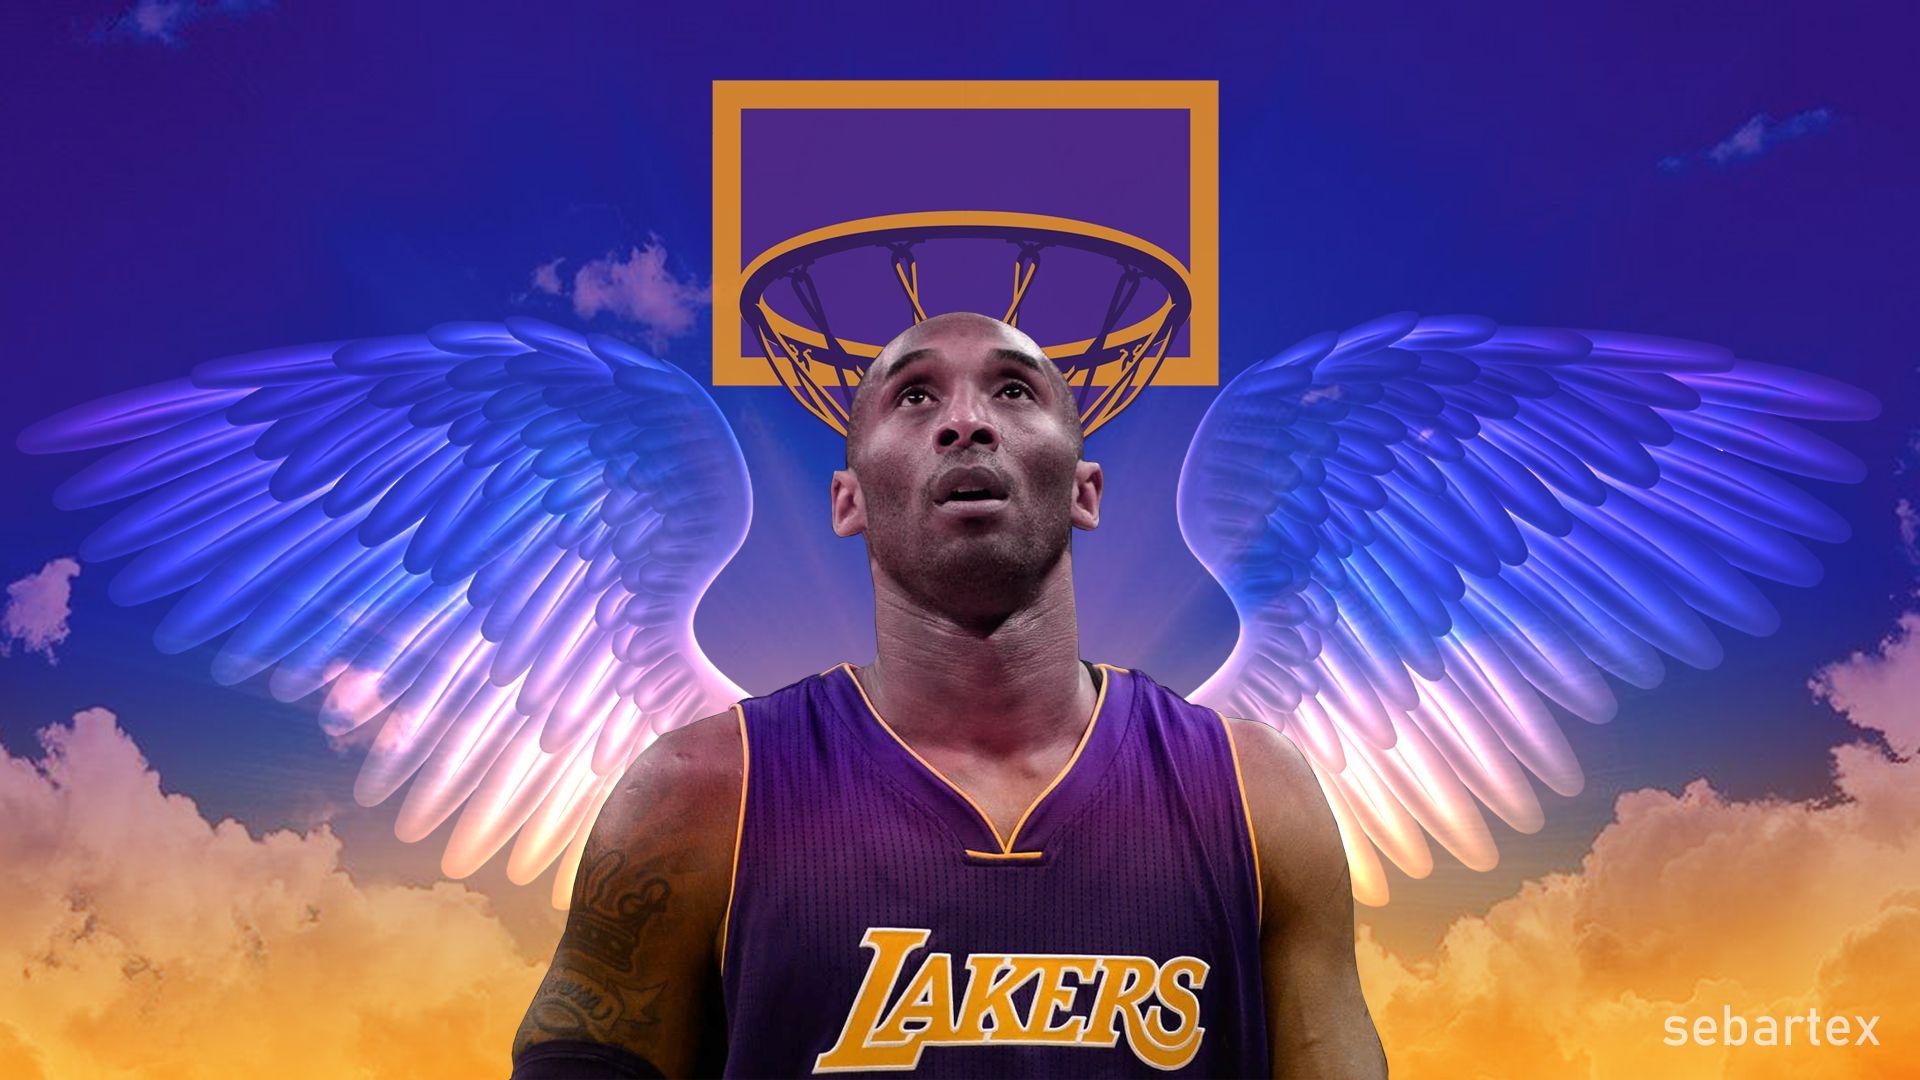 Kobe Bryant Cool Wallpapers   Top Kobe Bryant Cool 1920x1080